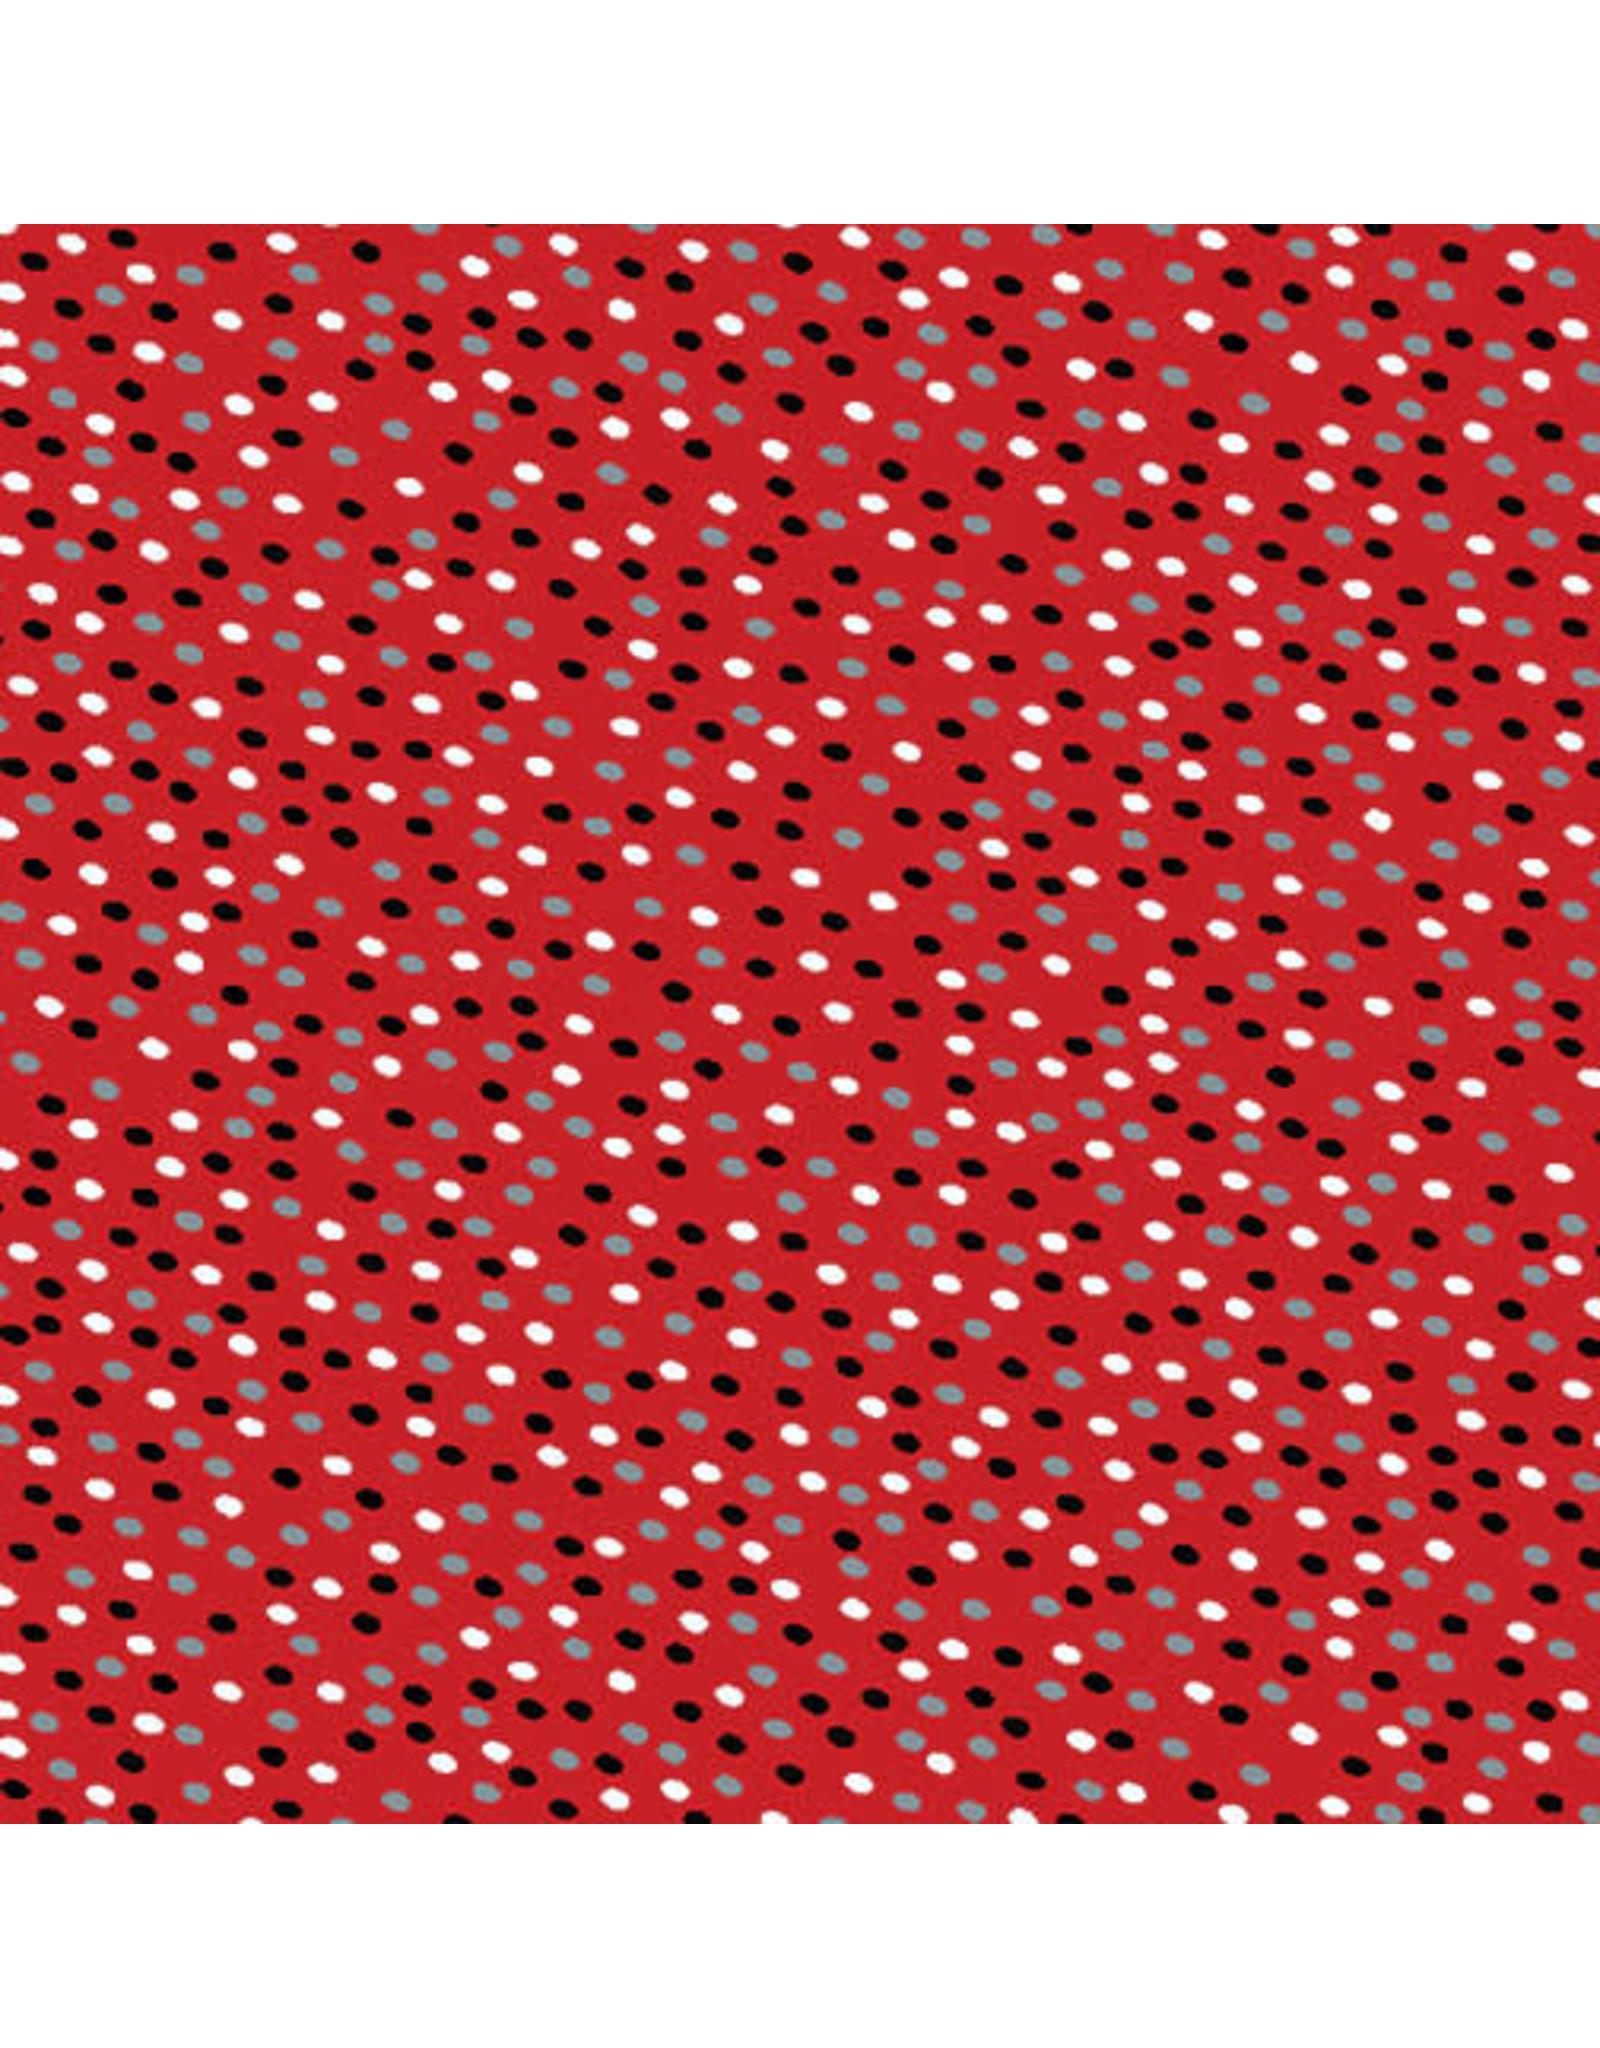 Kanvas Studio Cherry Twist - It's A Dot Cherry